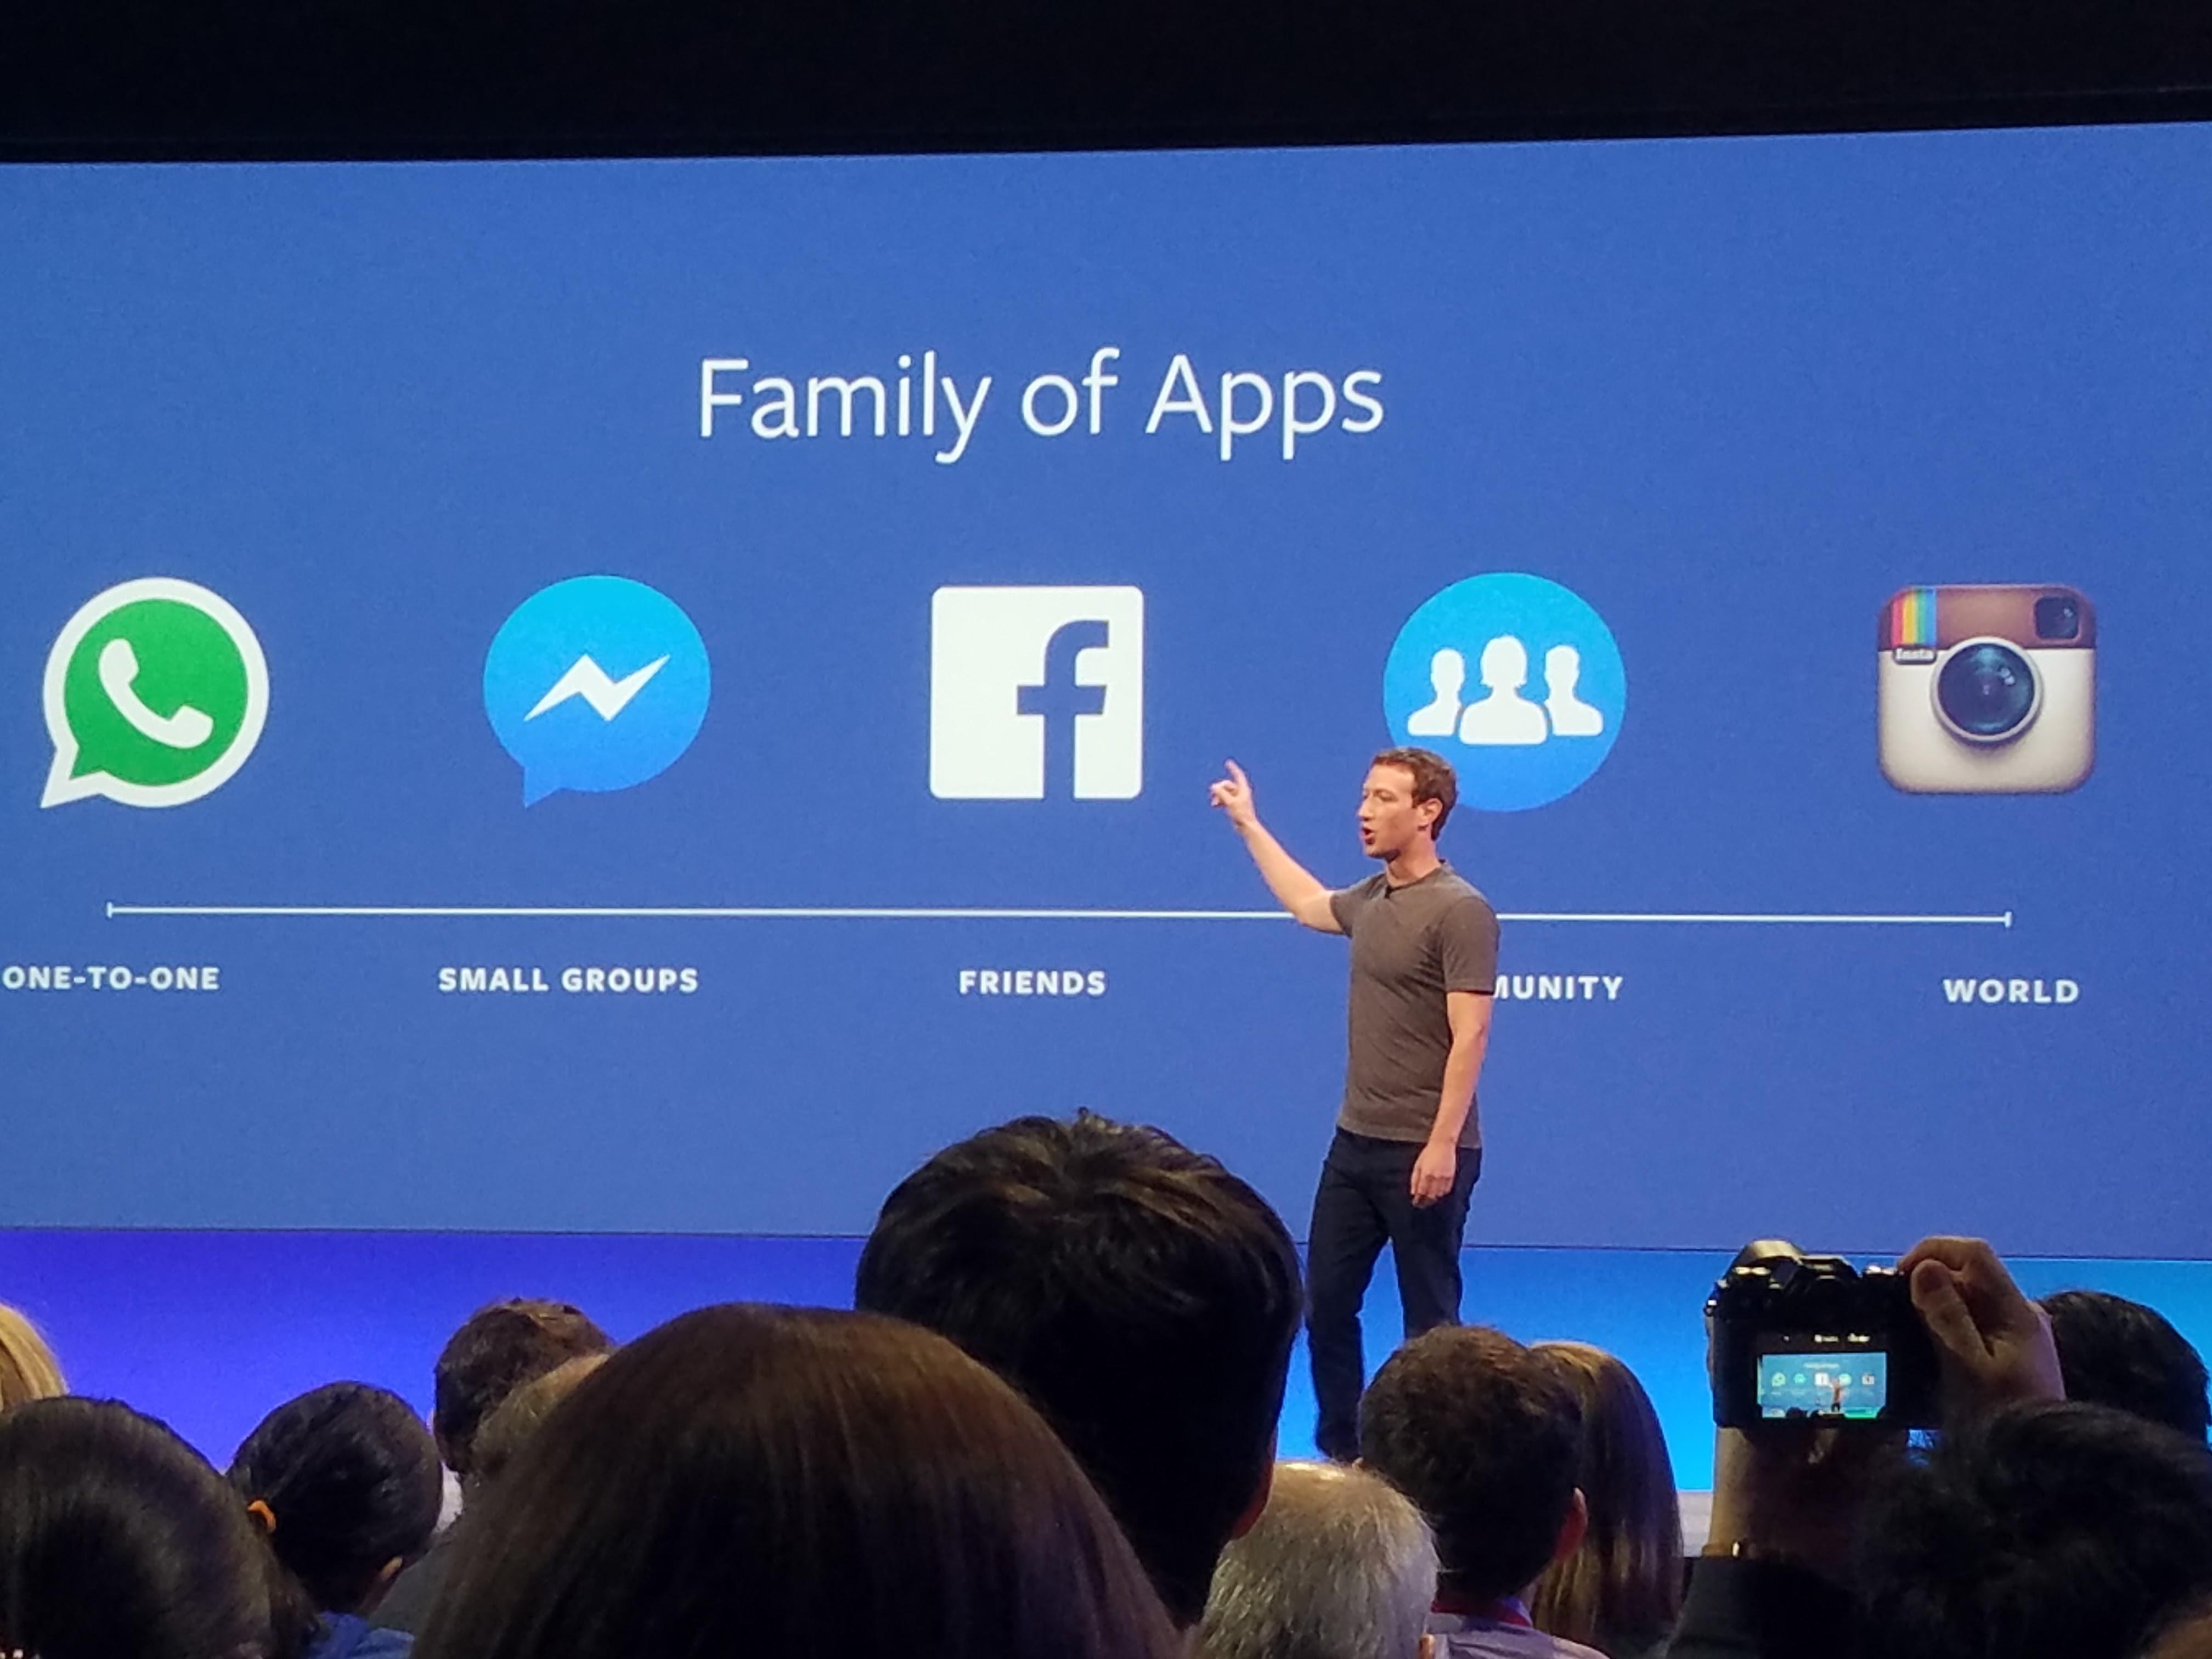 Facebook viser 100 millioner timer med video hver dag - nå skal de lage en app til TV-bokser og satse på orginalt innhold.